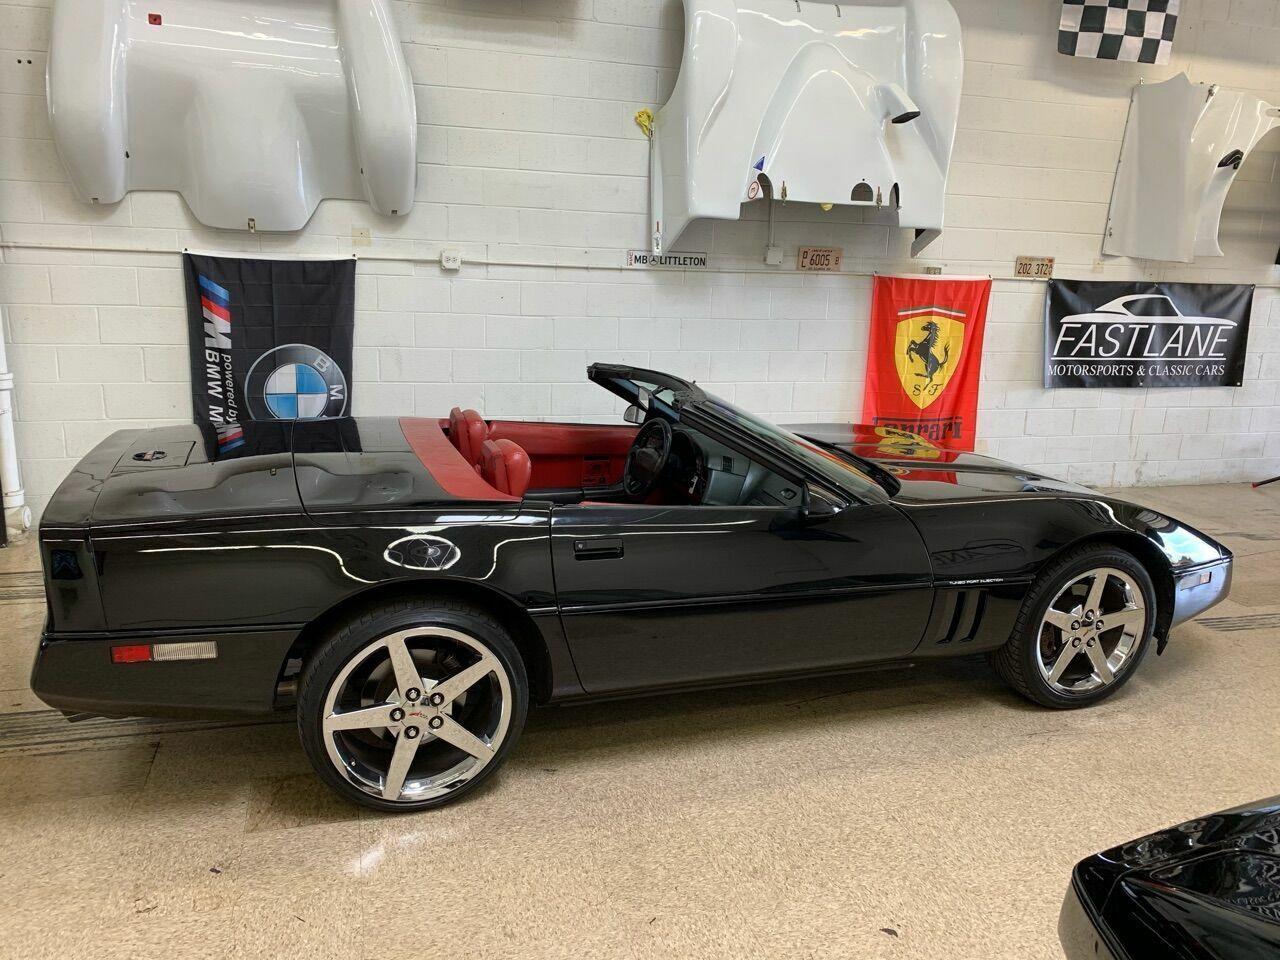 1990 Black Chevrolet Corvette Convertible    C4 Corvette Photo 6